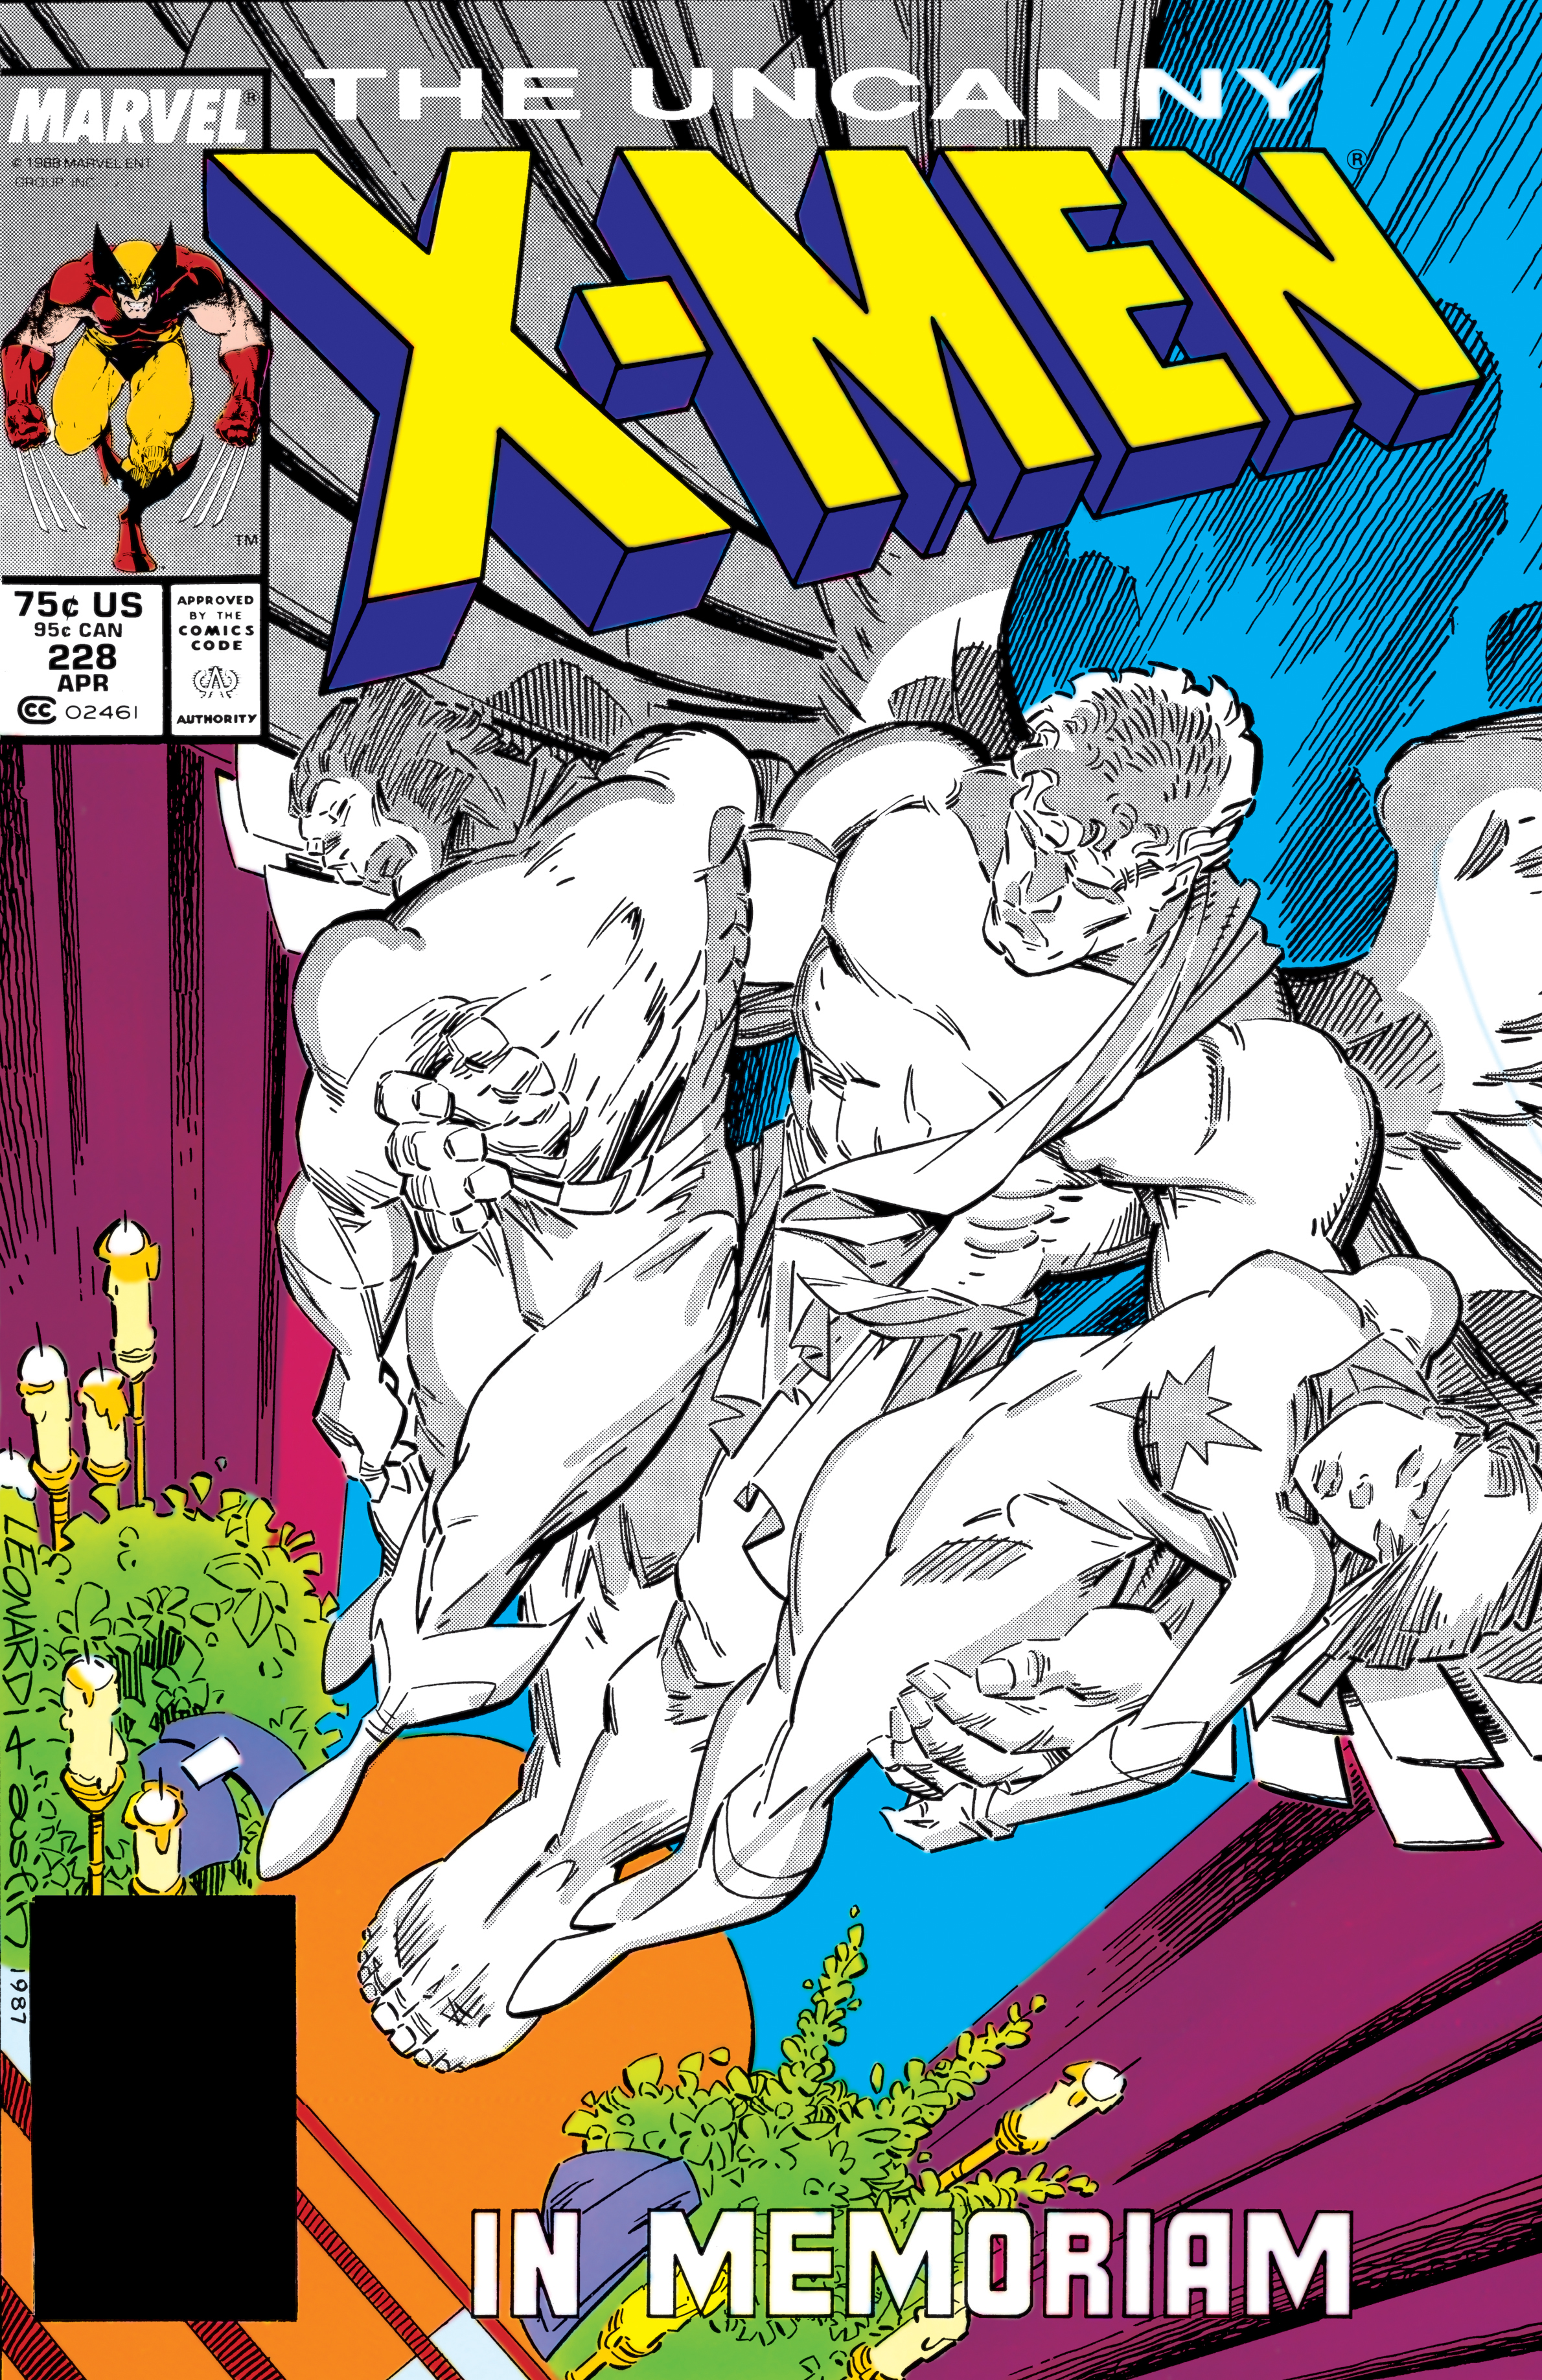 Uncanny X-Men (1963) #228